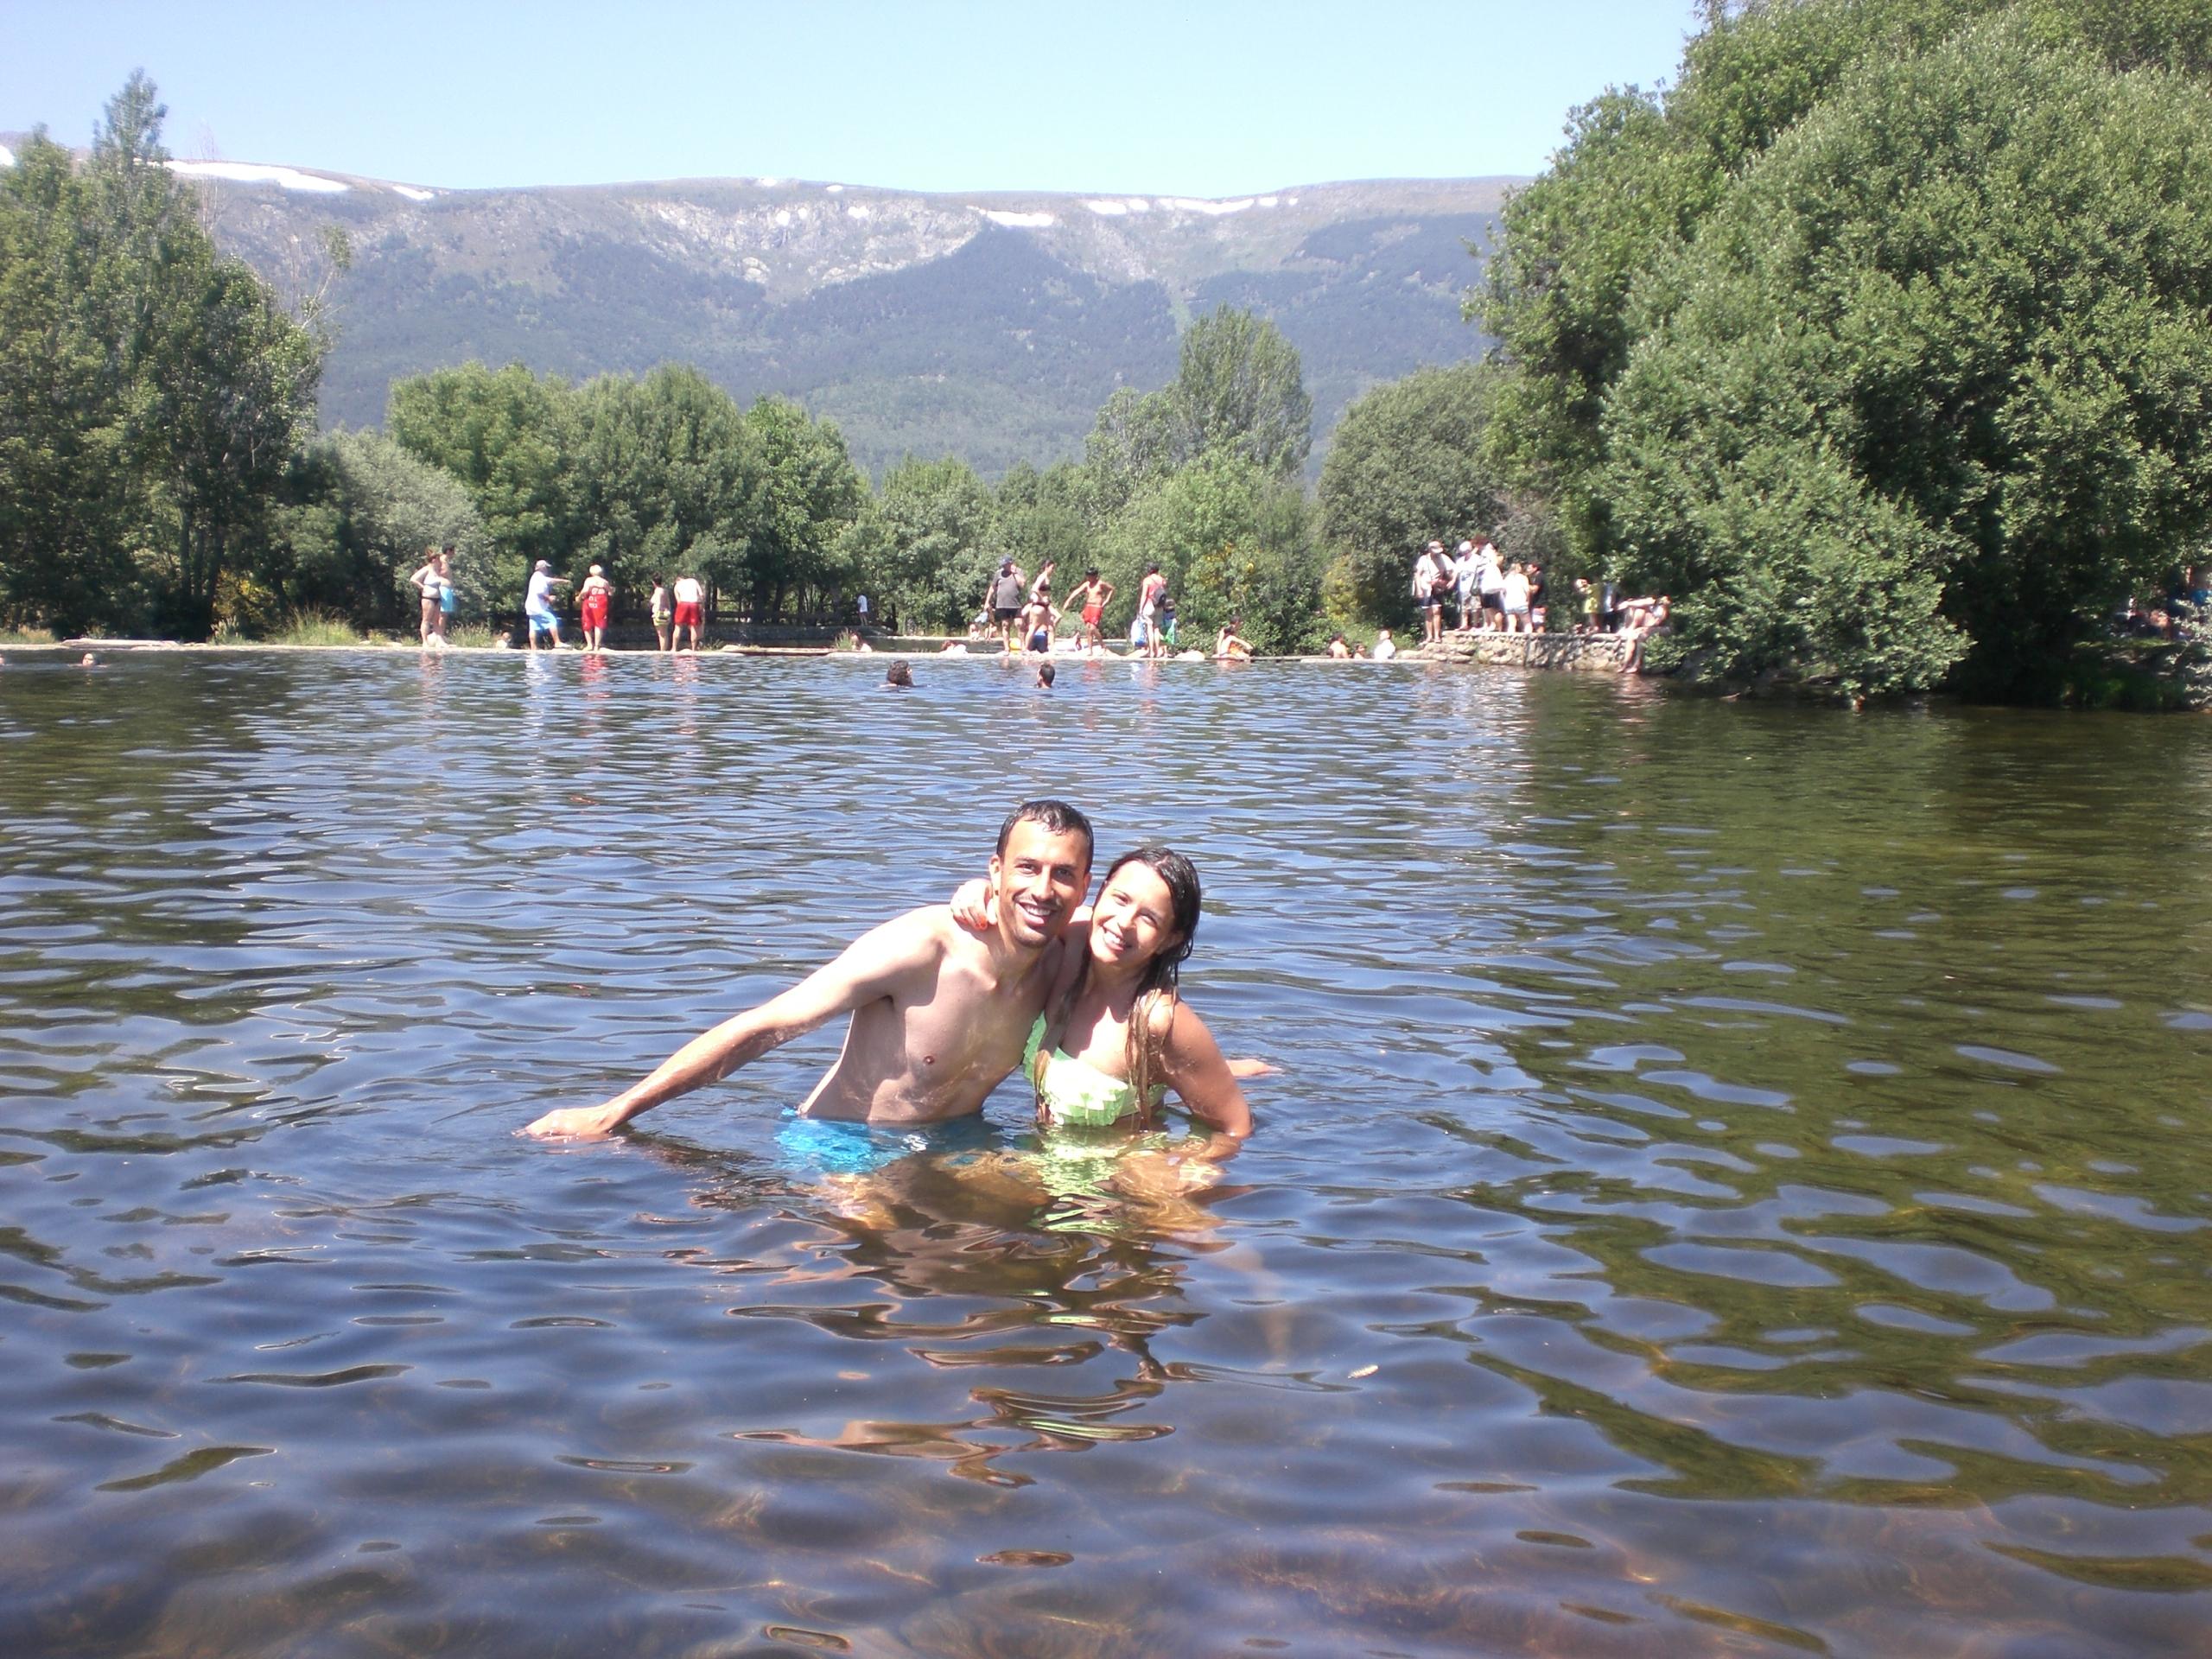 Piscinas naturales en rascafr a madrid natural pools in for Las presillas piscinas naturales